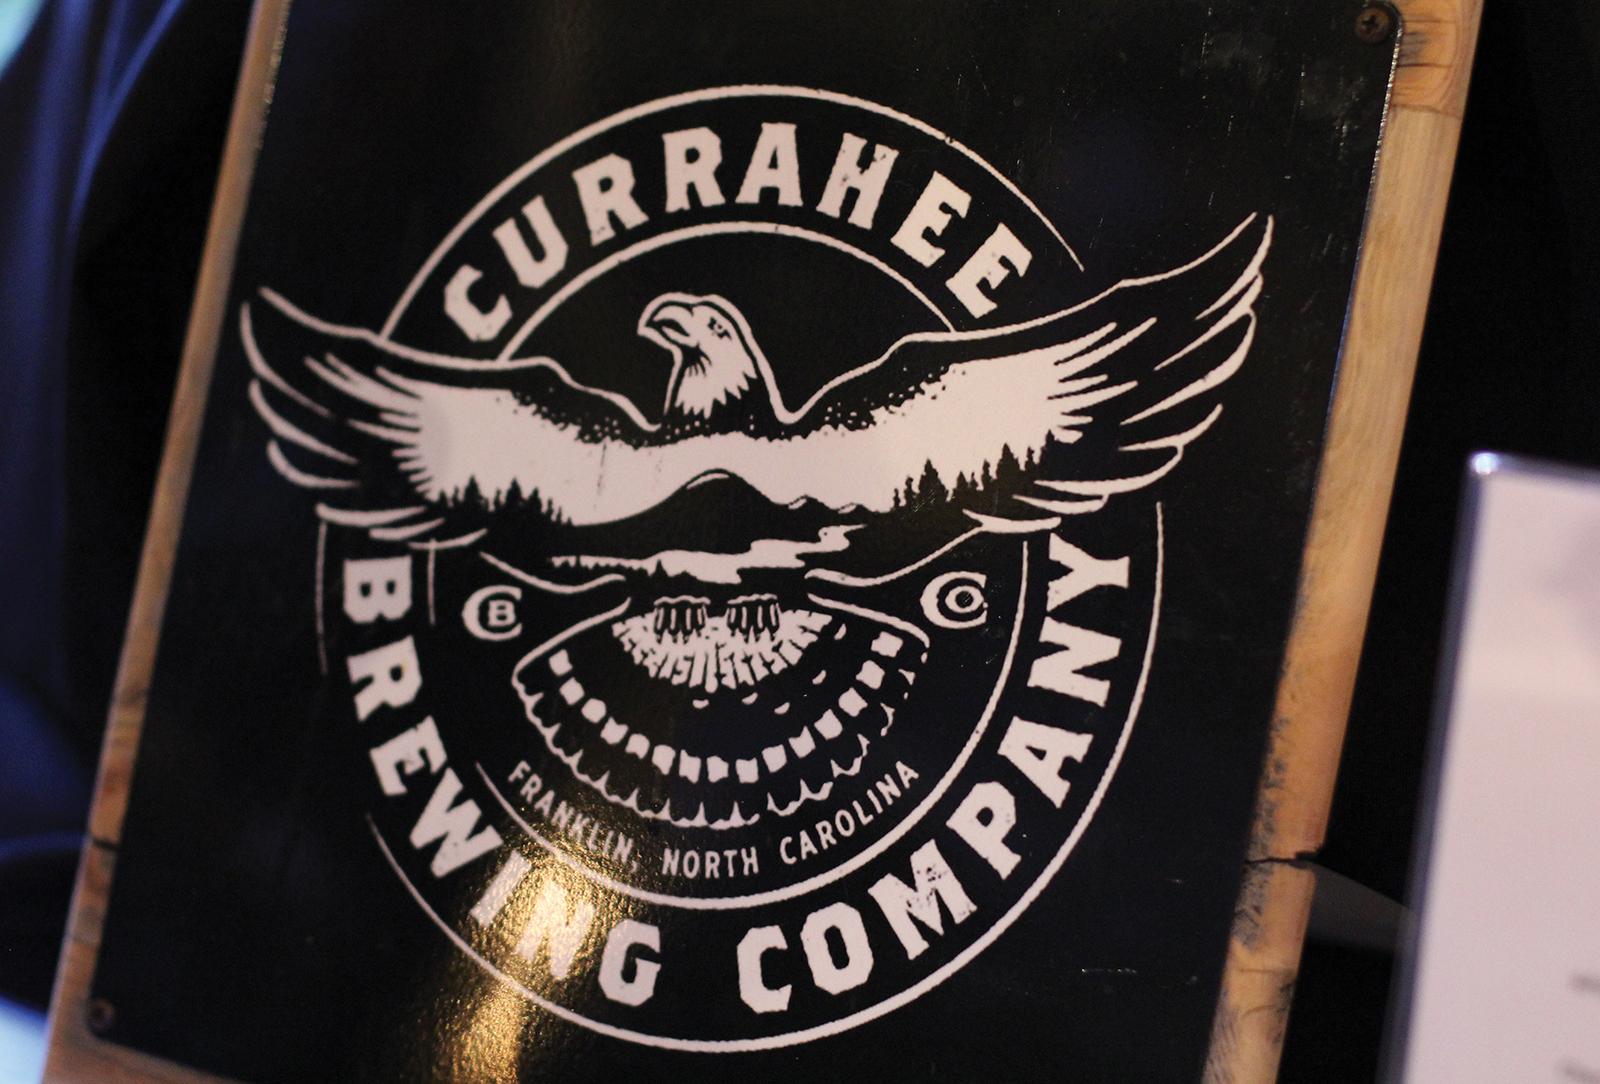 craft-beer-night-rotary-highlands-nc-currhee